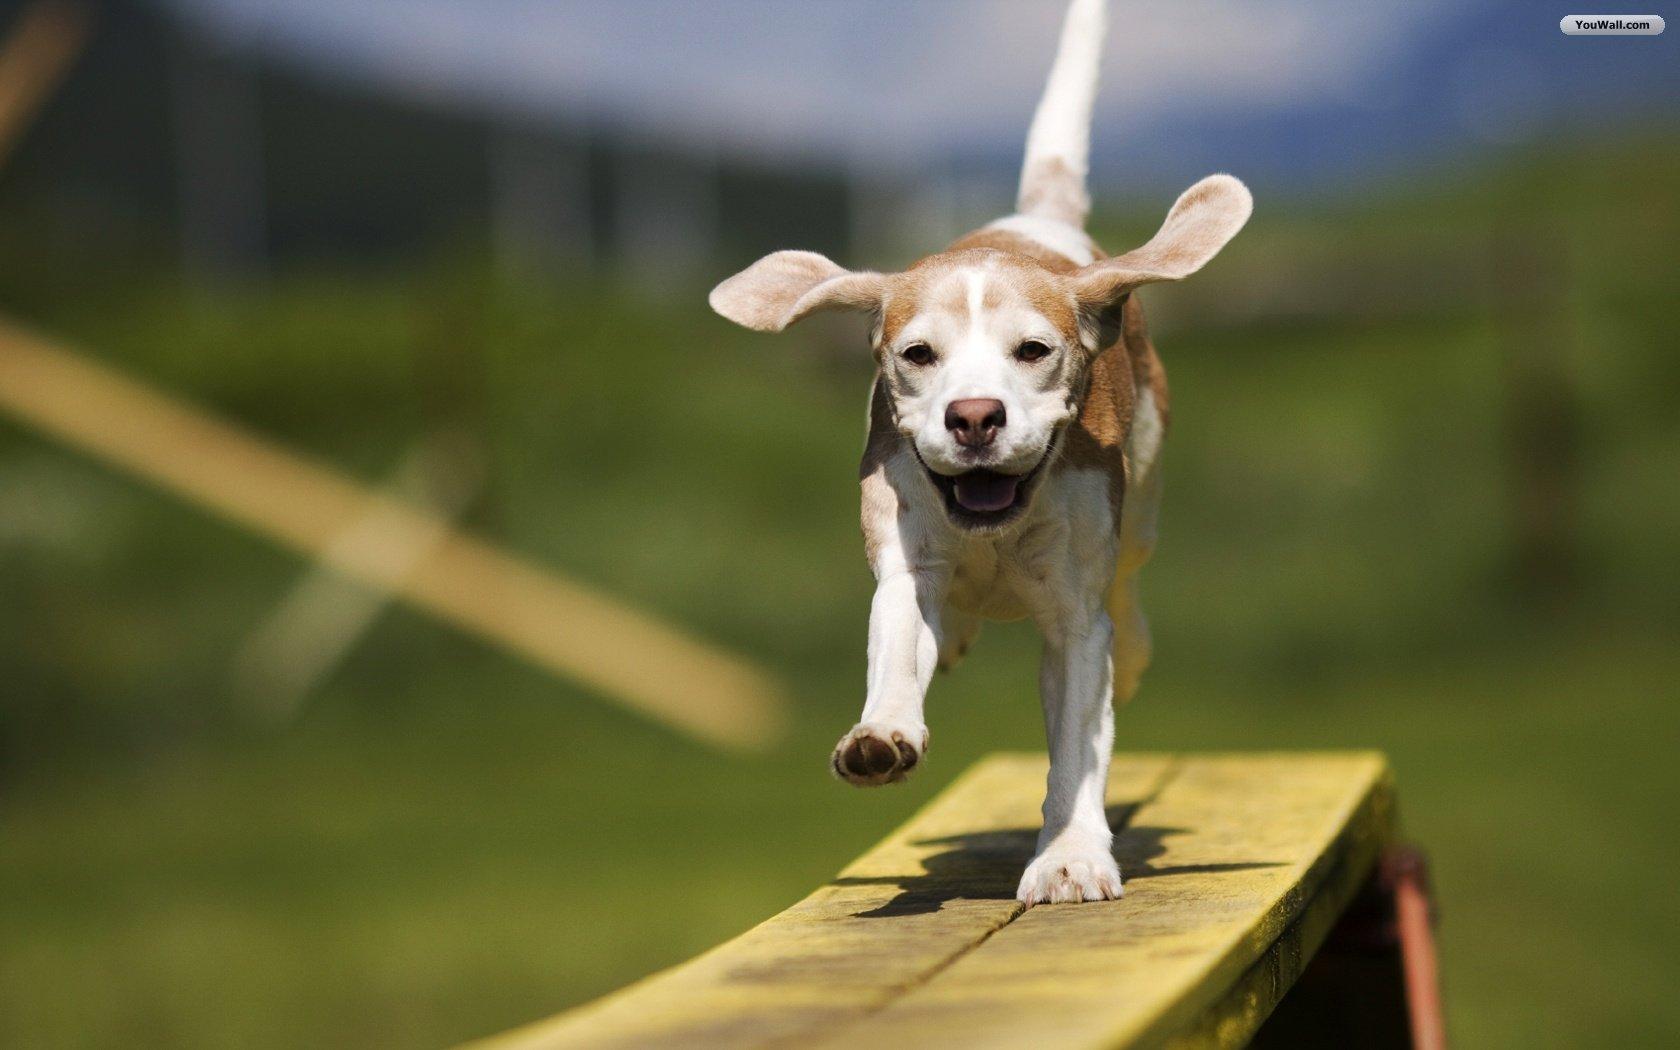 http://hqtiger.mobi/wp-content/uploads/happy-dog-wallpaper-7.jpg